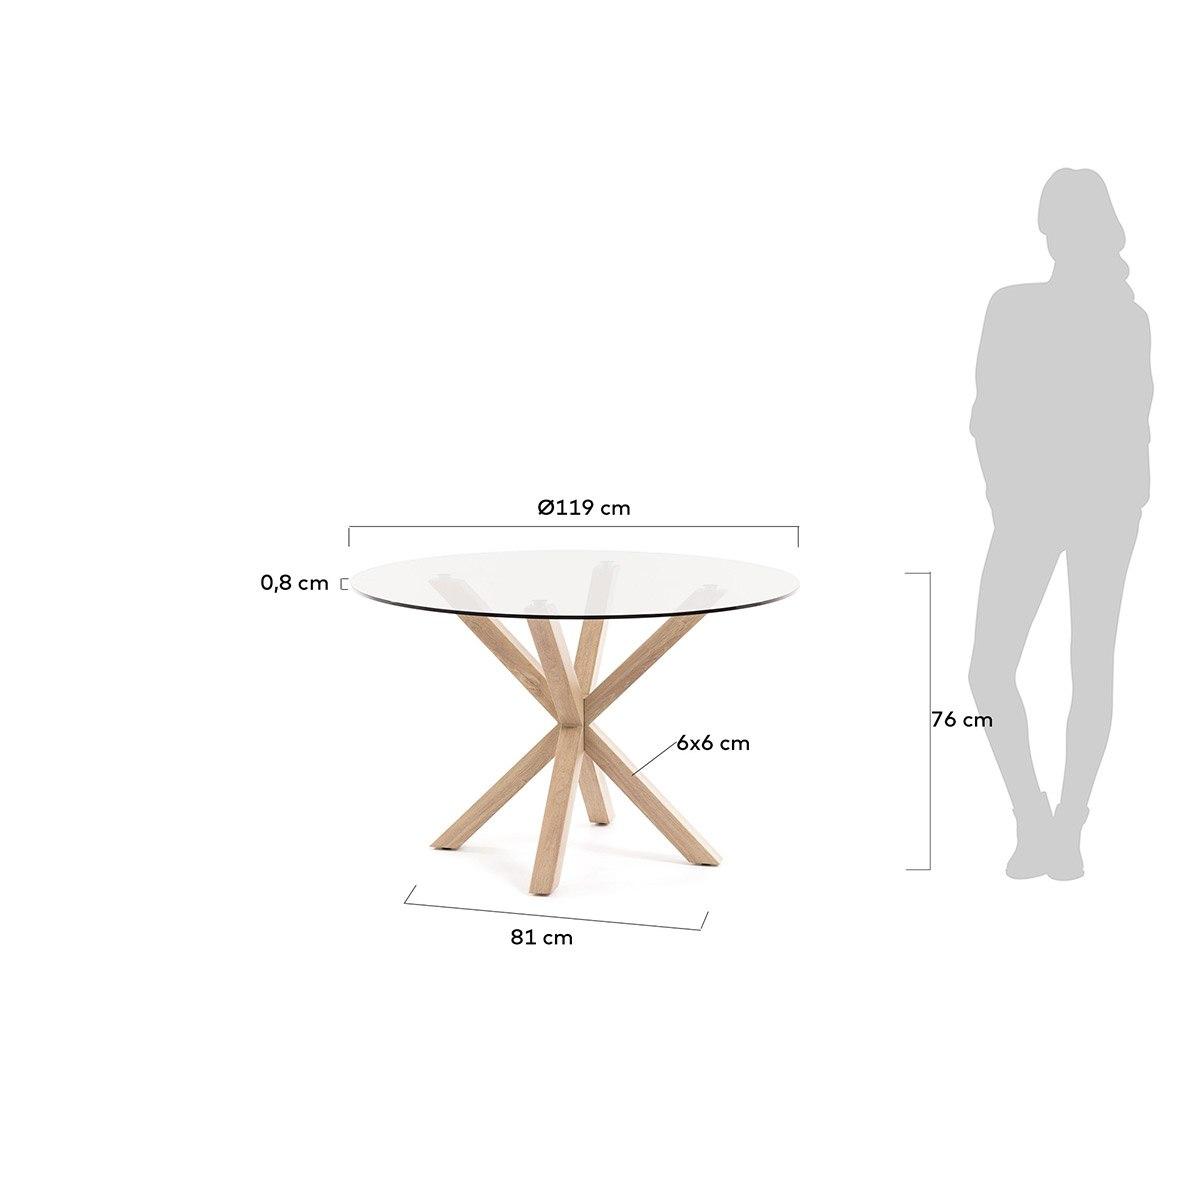 Mesa comedor redonda cristal - Artikalia - Mesas de comedor